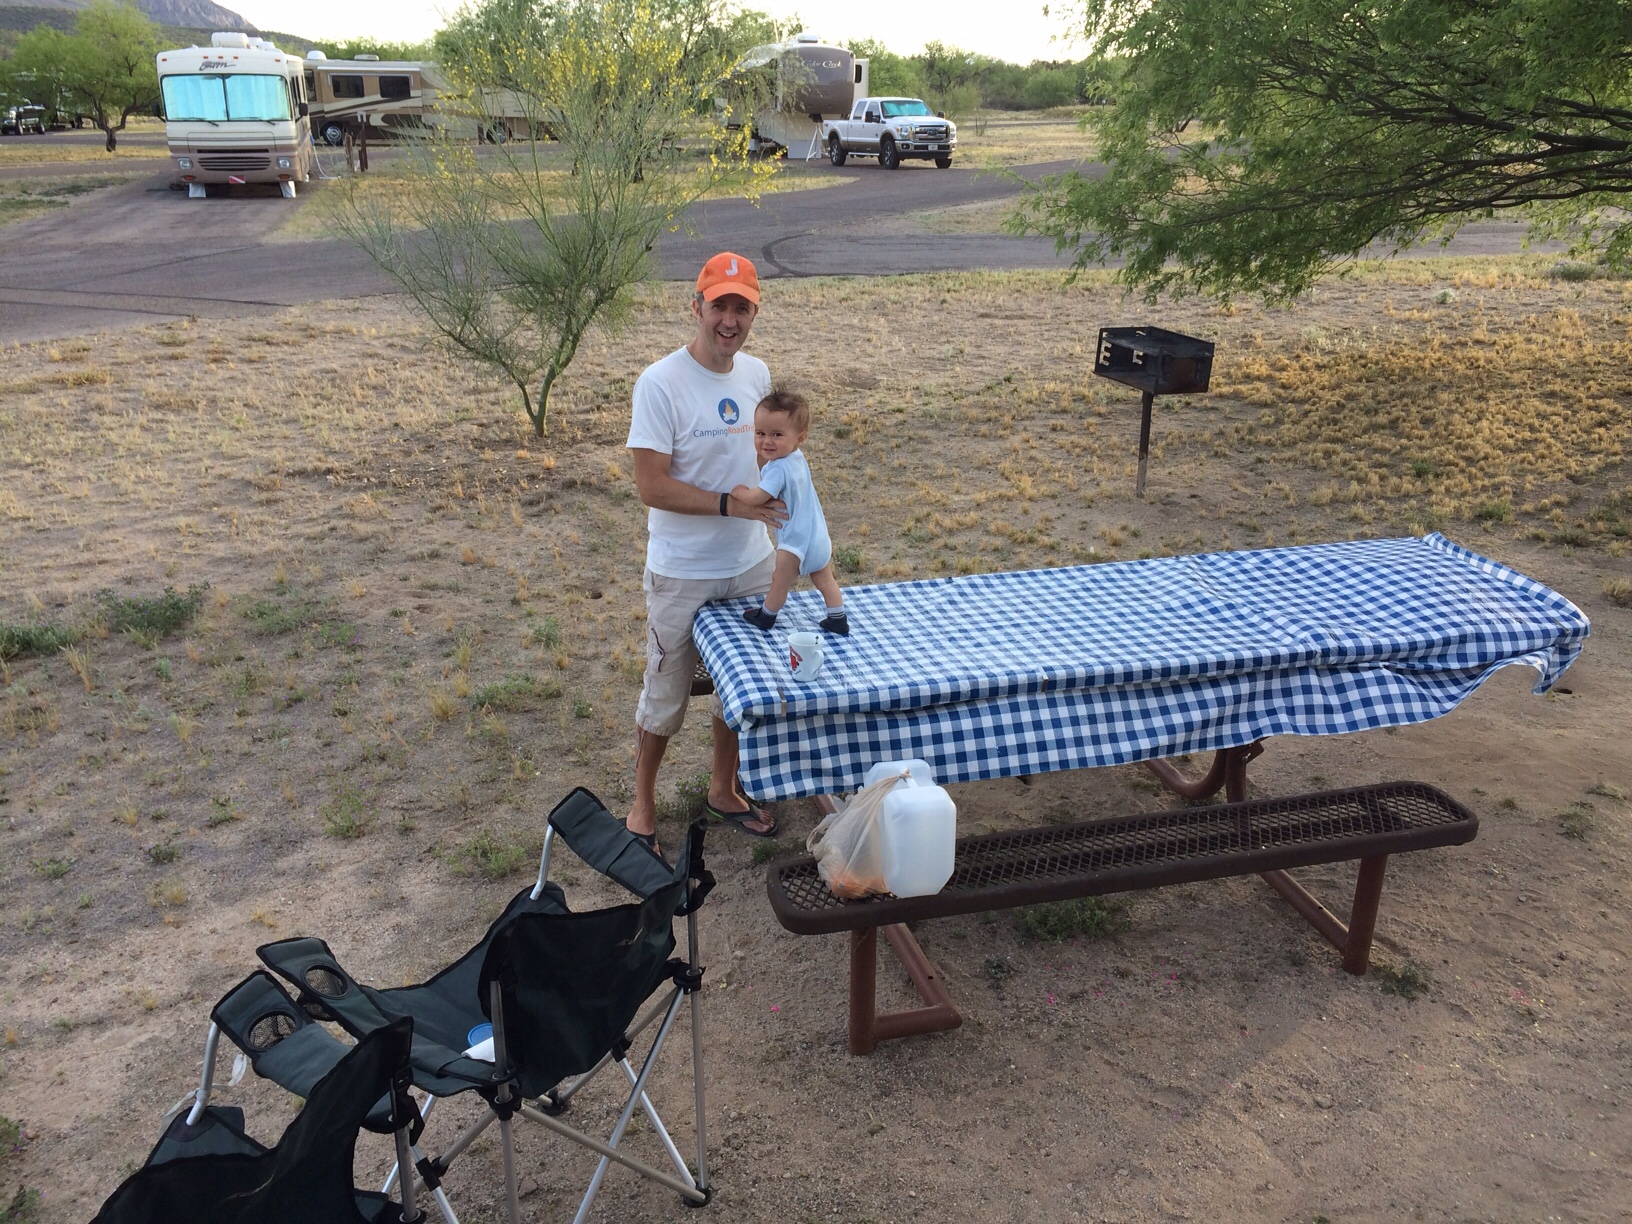 Baby boy O walking on picnic table